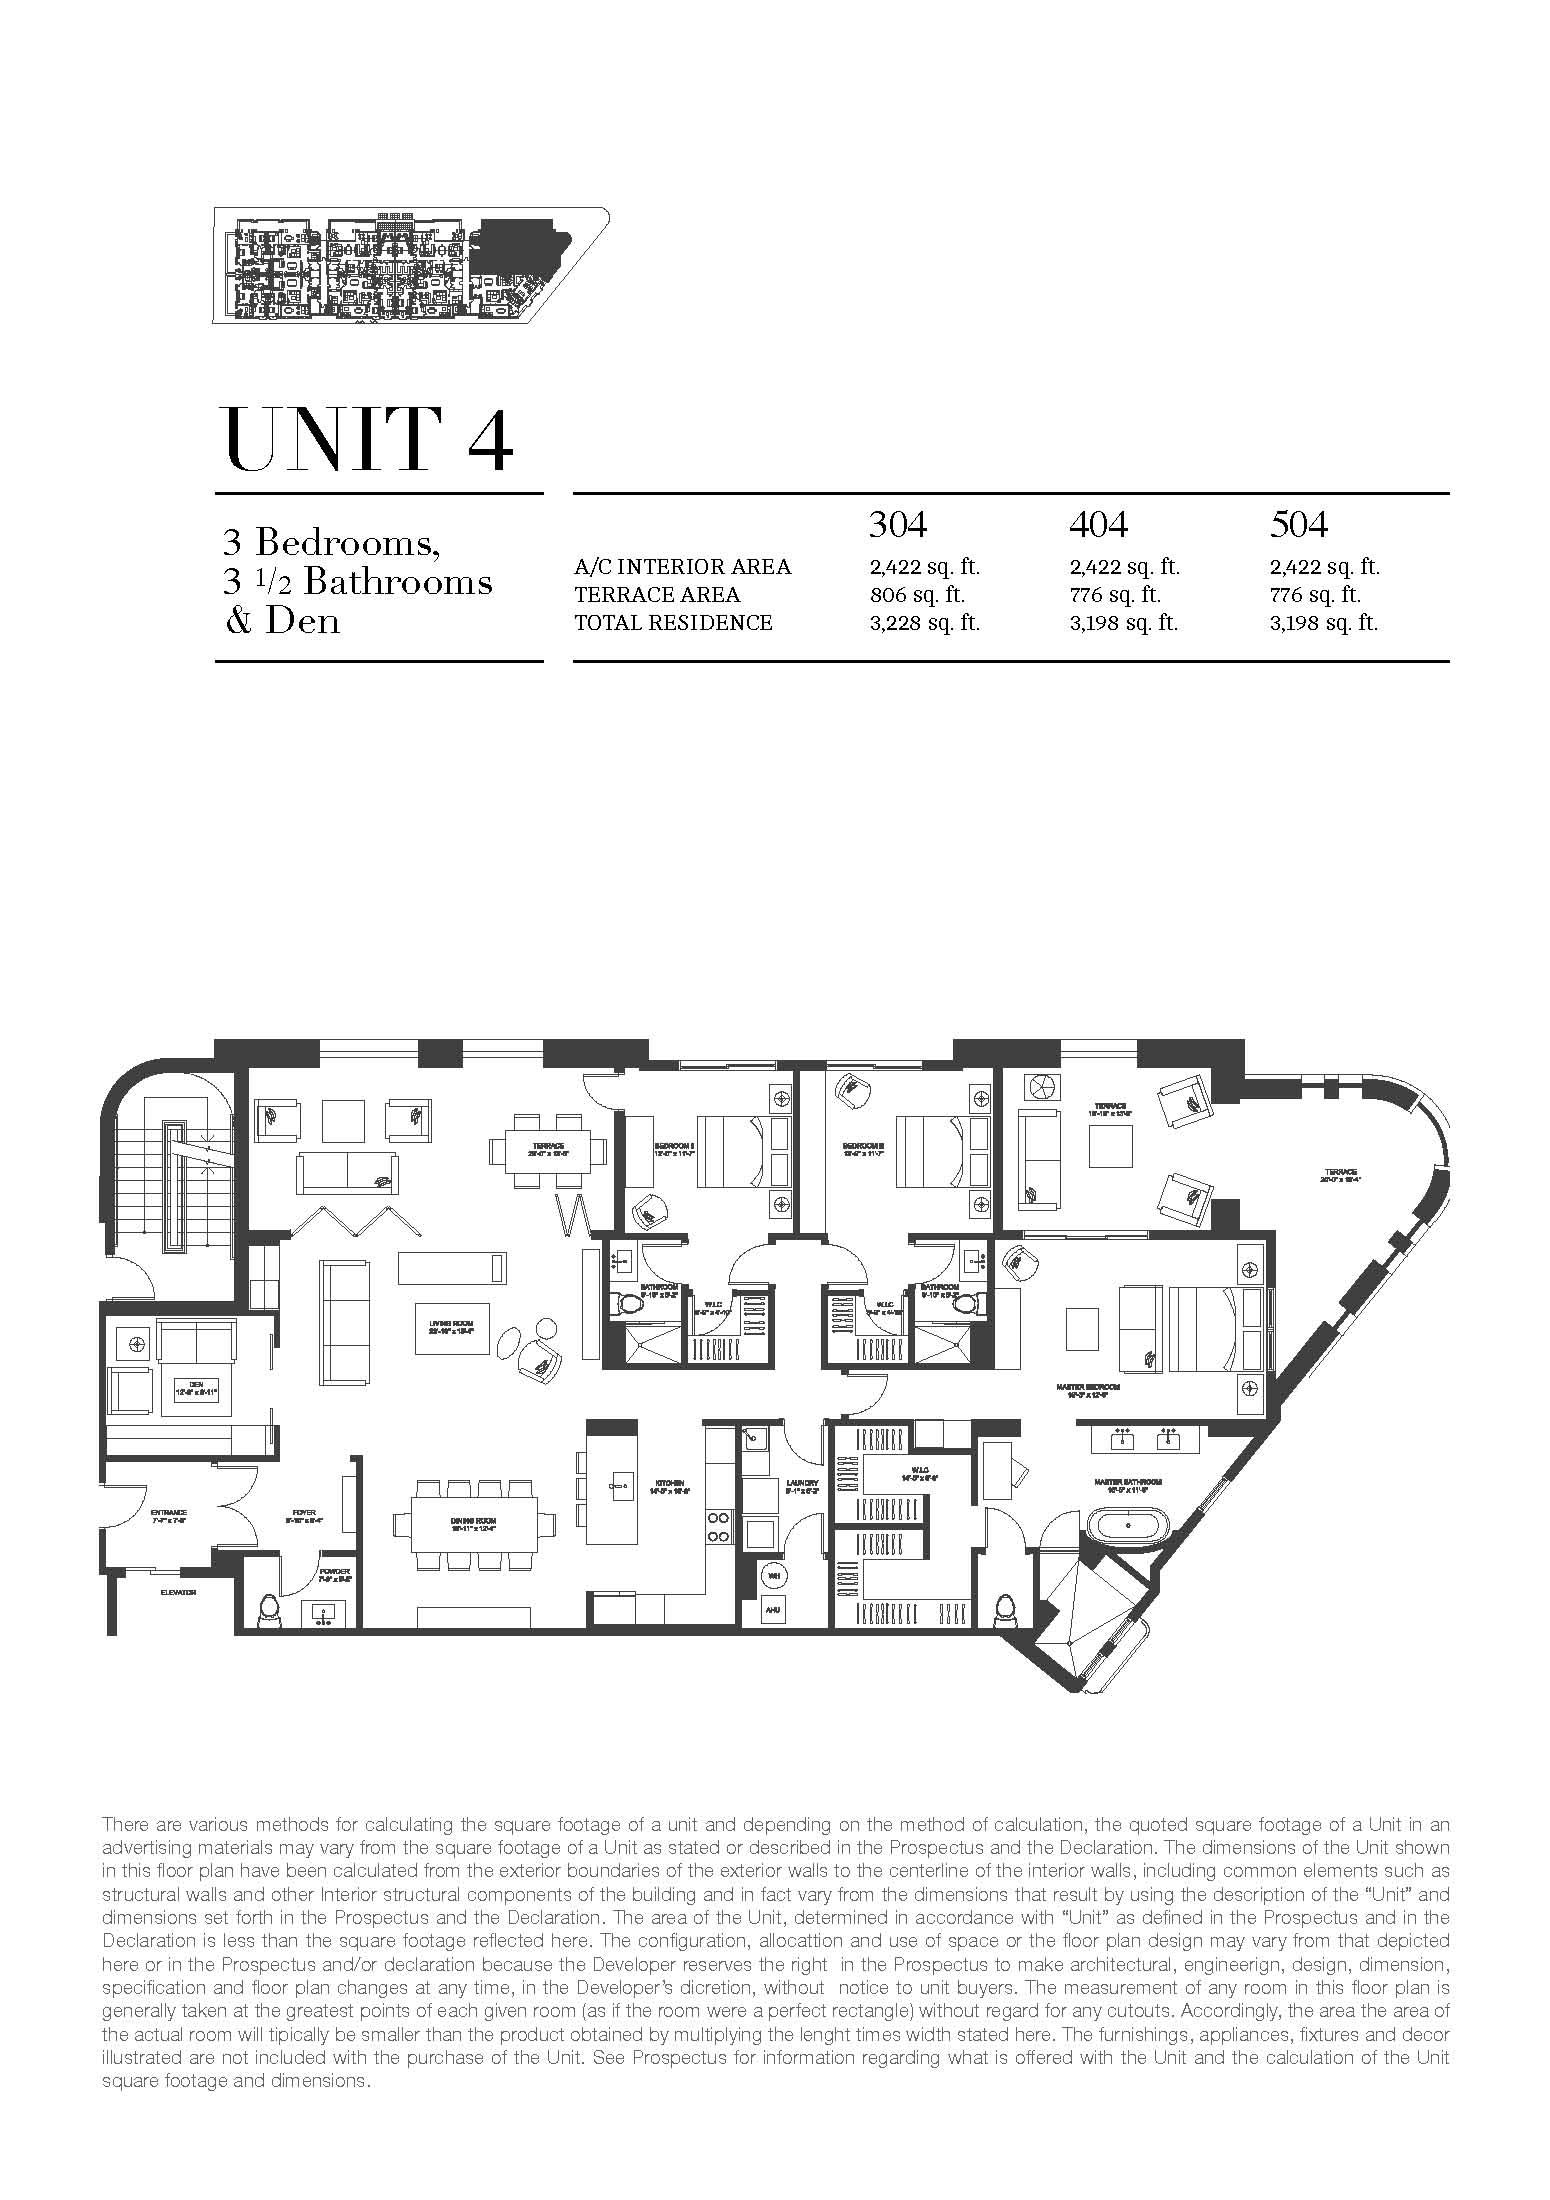 Biltmore Parc - Floorplan 4